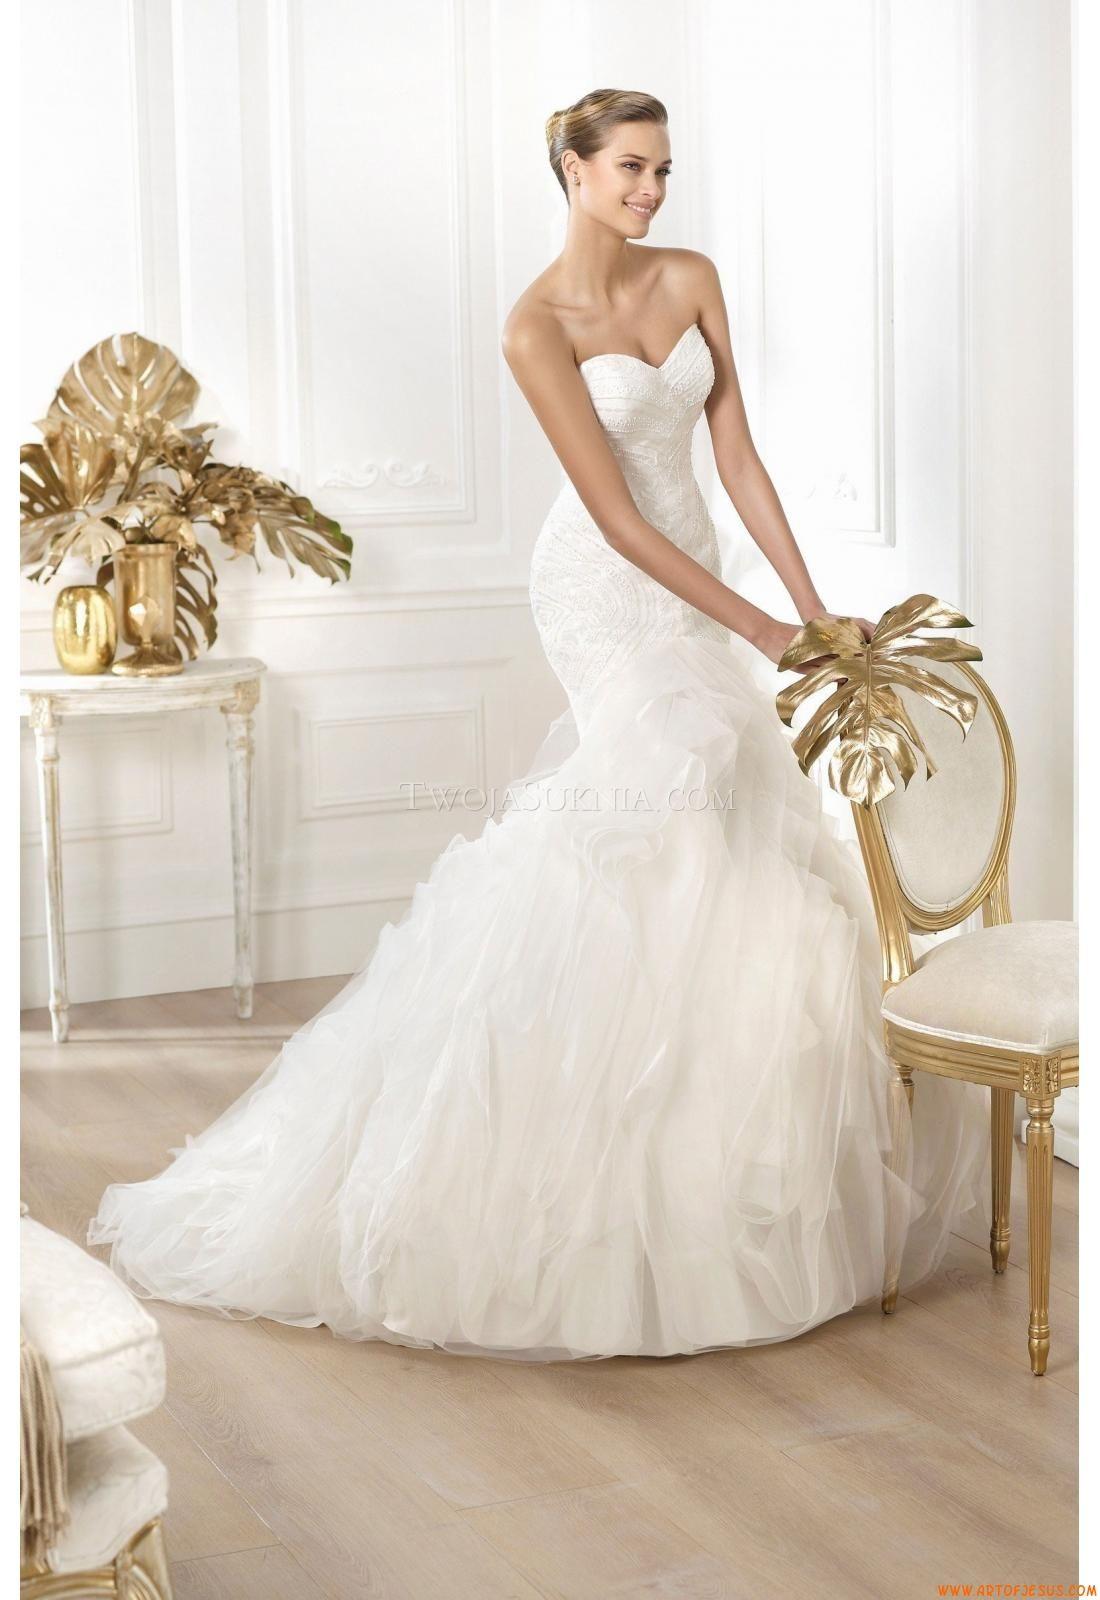 Brautkleider Pronovias Leire 2014 | organza wedding dresses ...